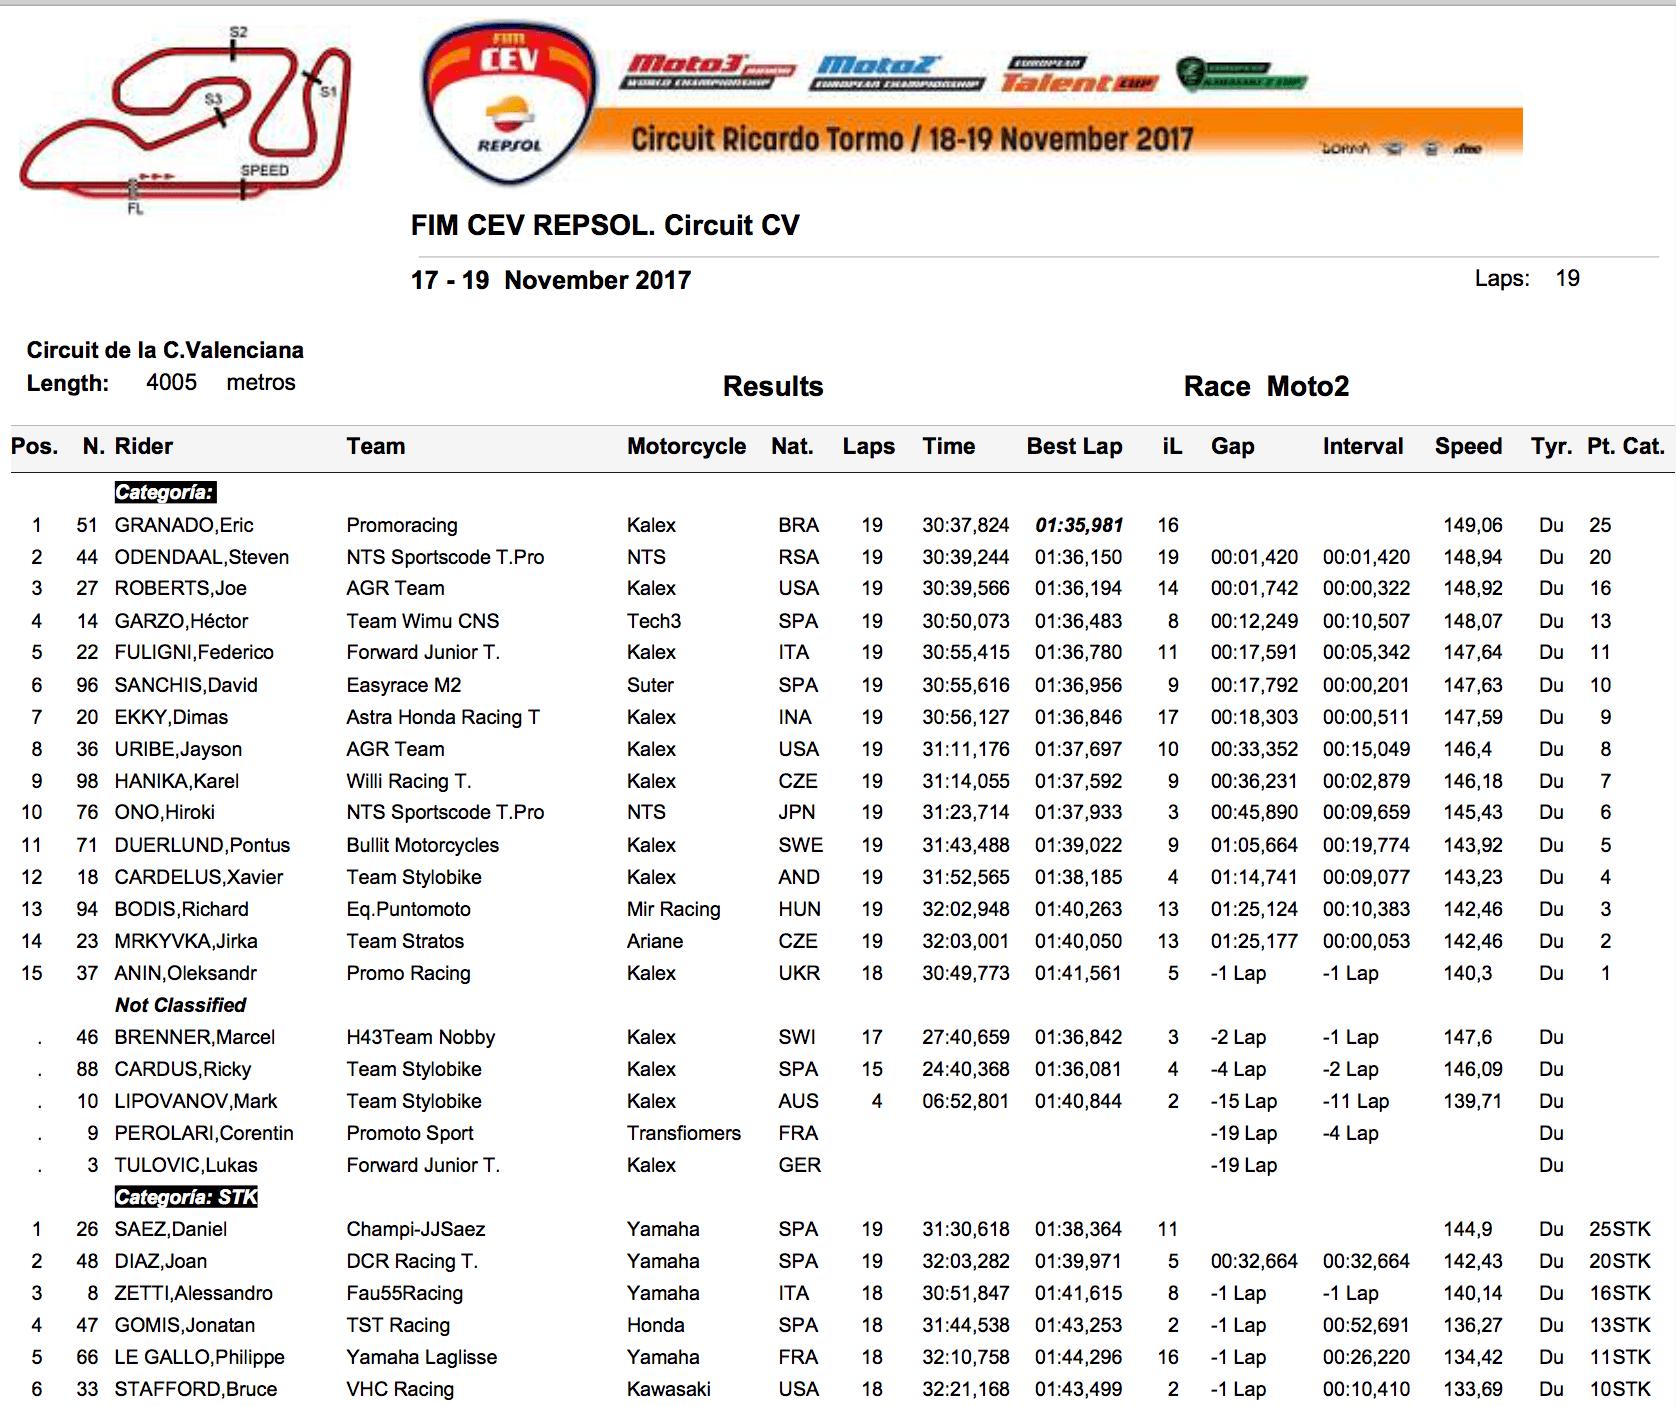 ★CEV Repsol 2017バレンシア戦 Moto2クラス決勝レース結果